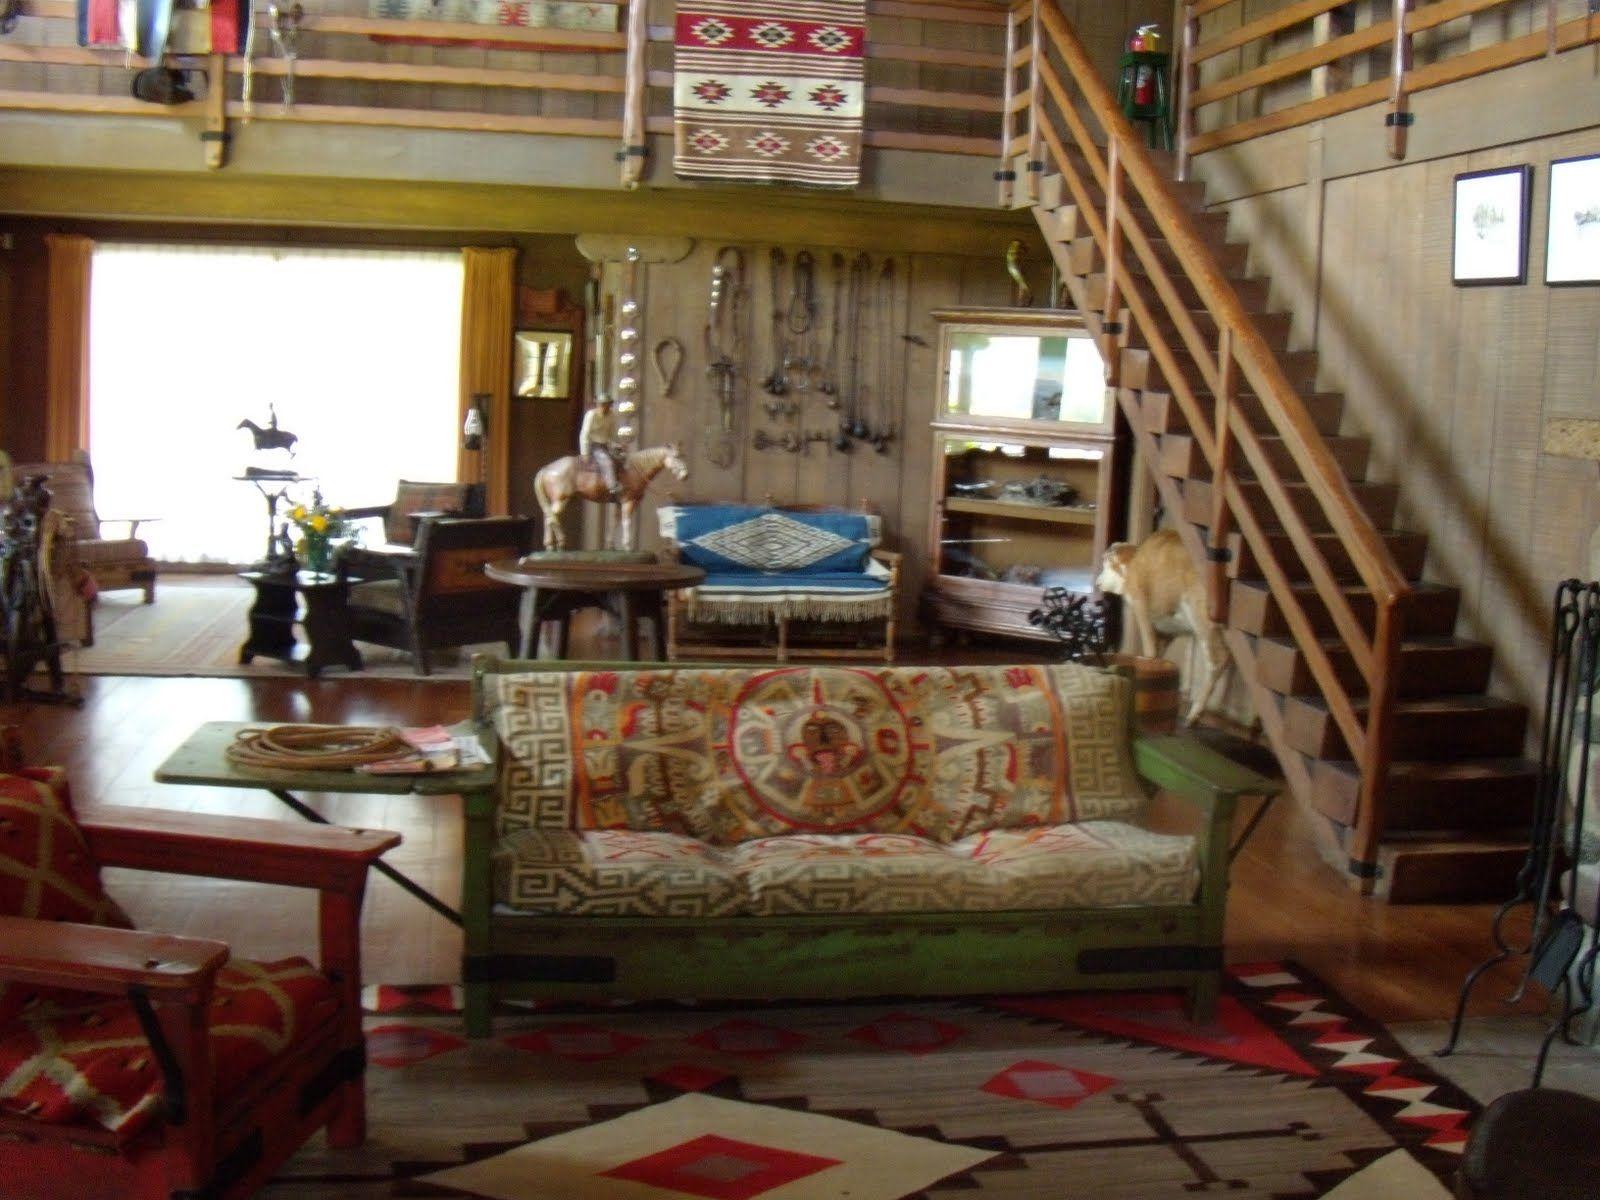 House Junk Gypsy Decorating Ideas